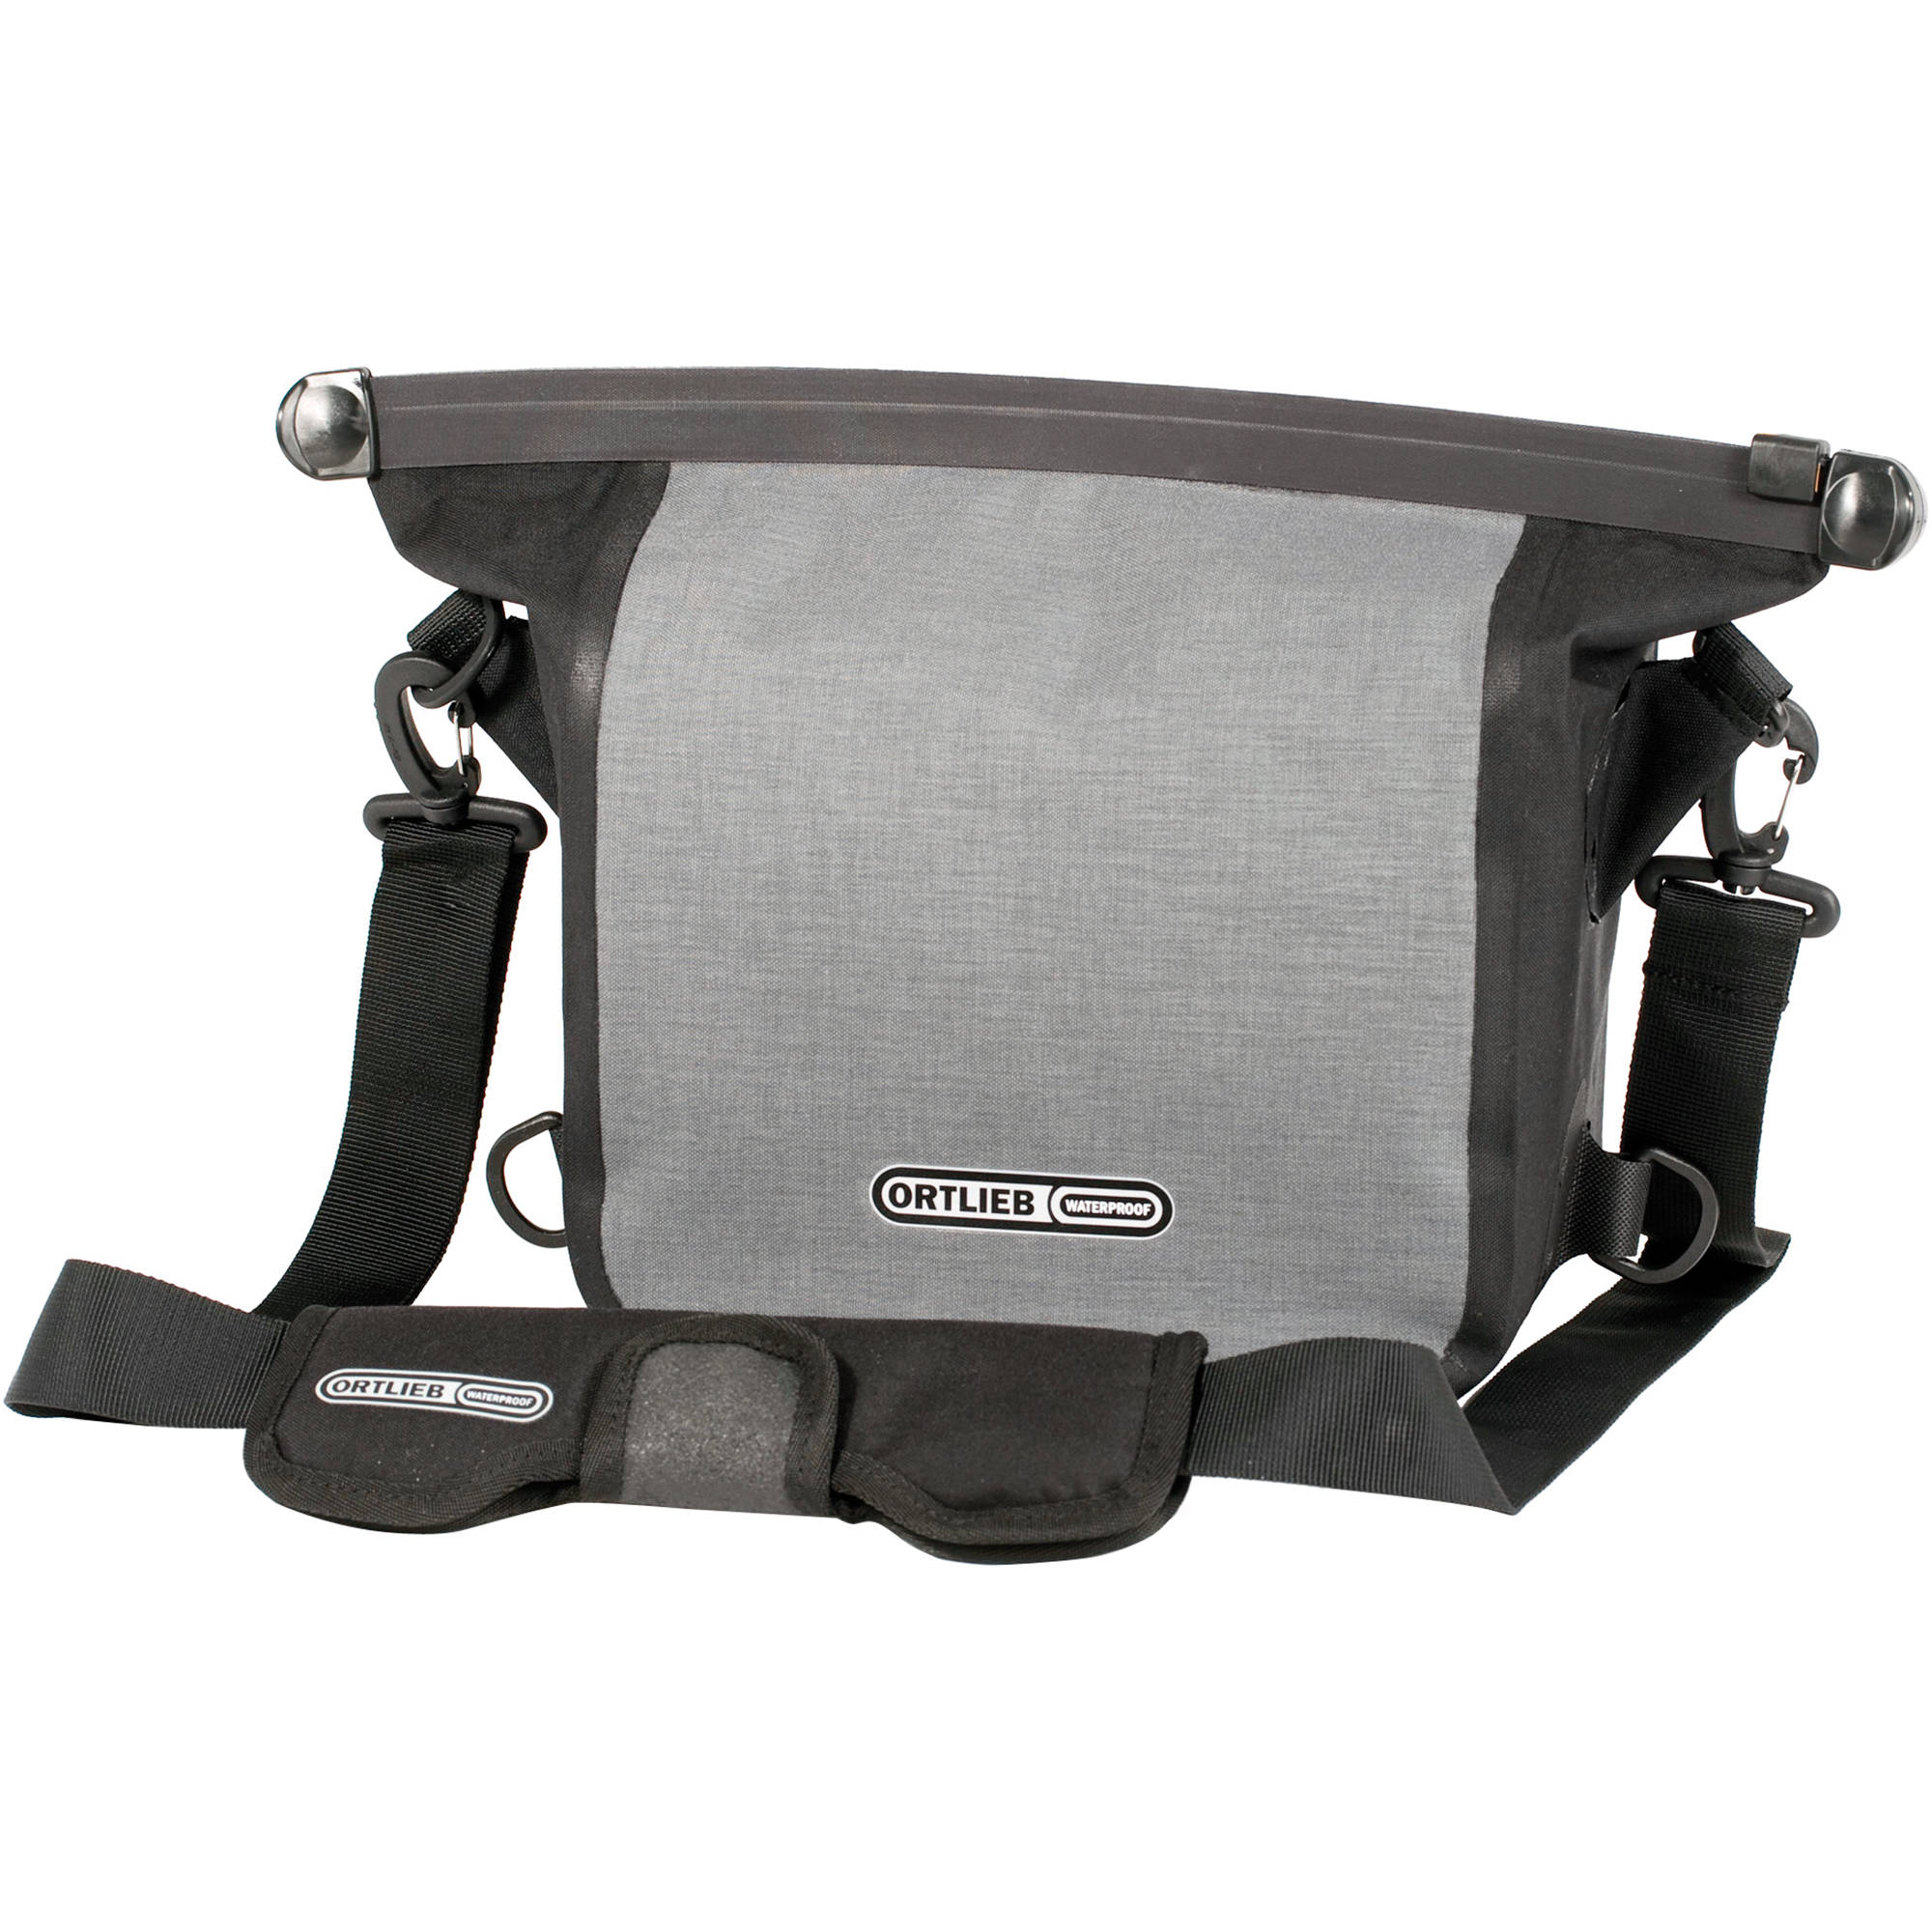 Ortlieb Aqua Cam Waterproof Camera Bag Graphite Black